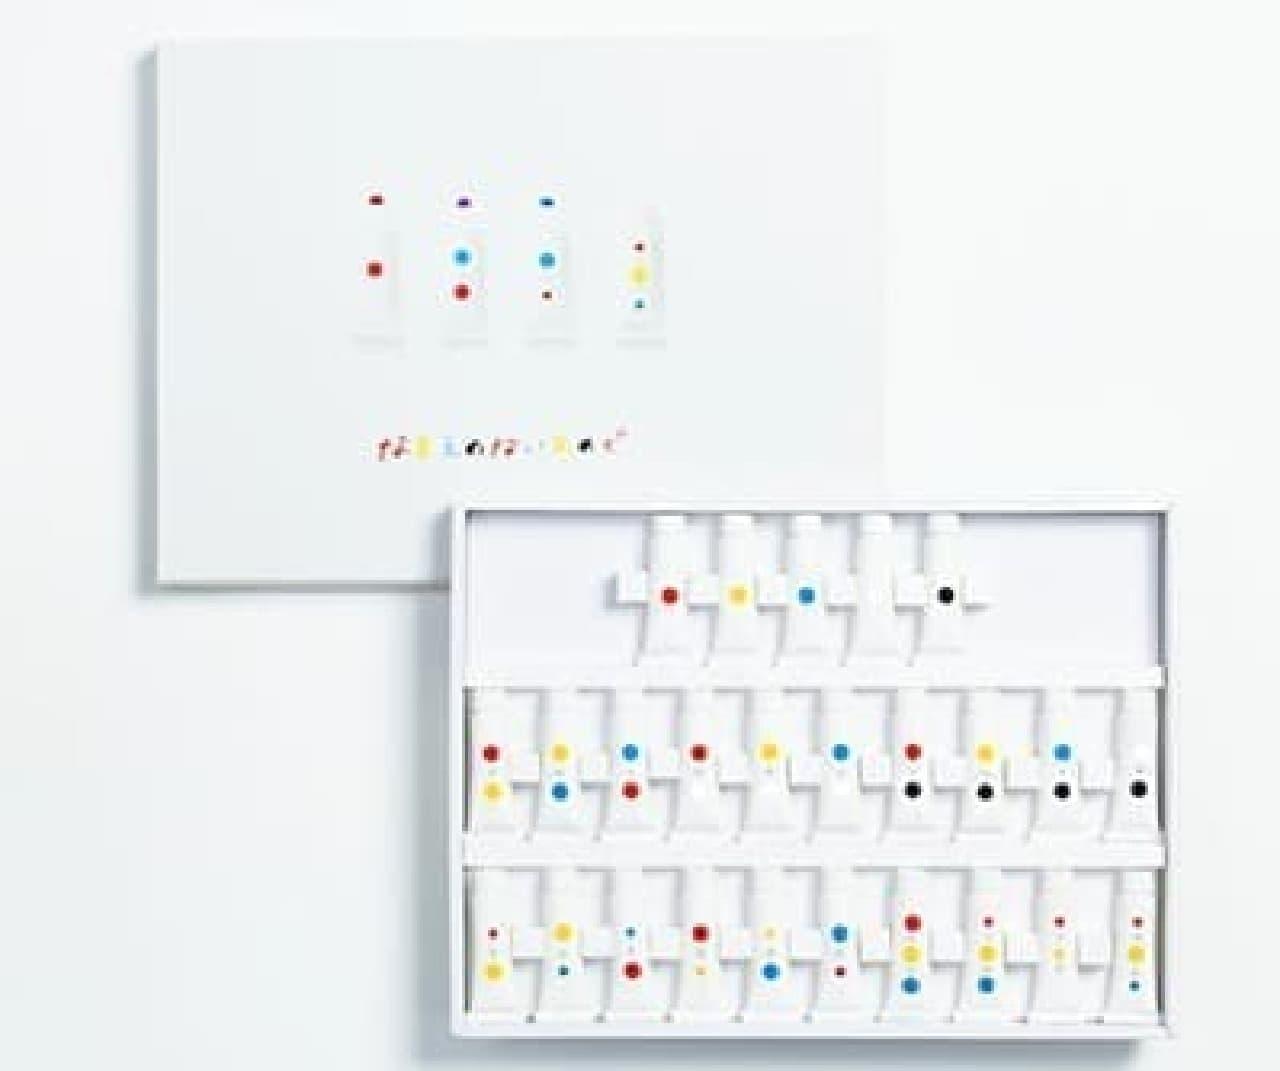 「KOKUYO DESIGN AWARD 2012」に出品された「なまえのないえのぐ」  当時は25色だった